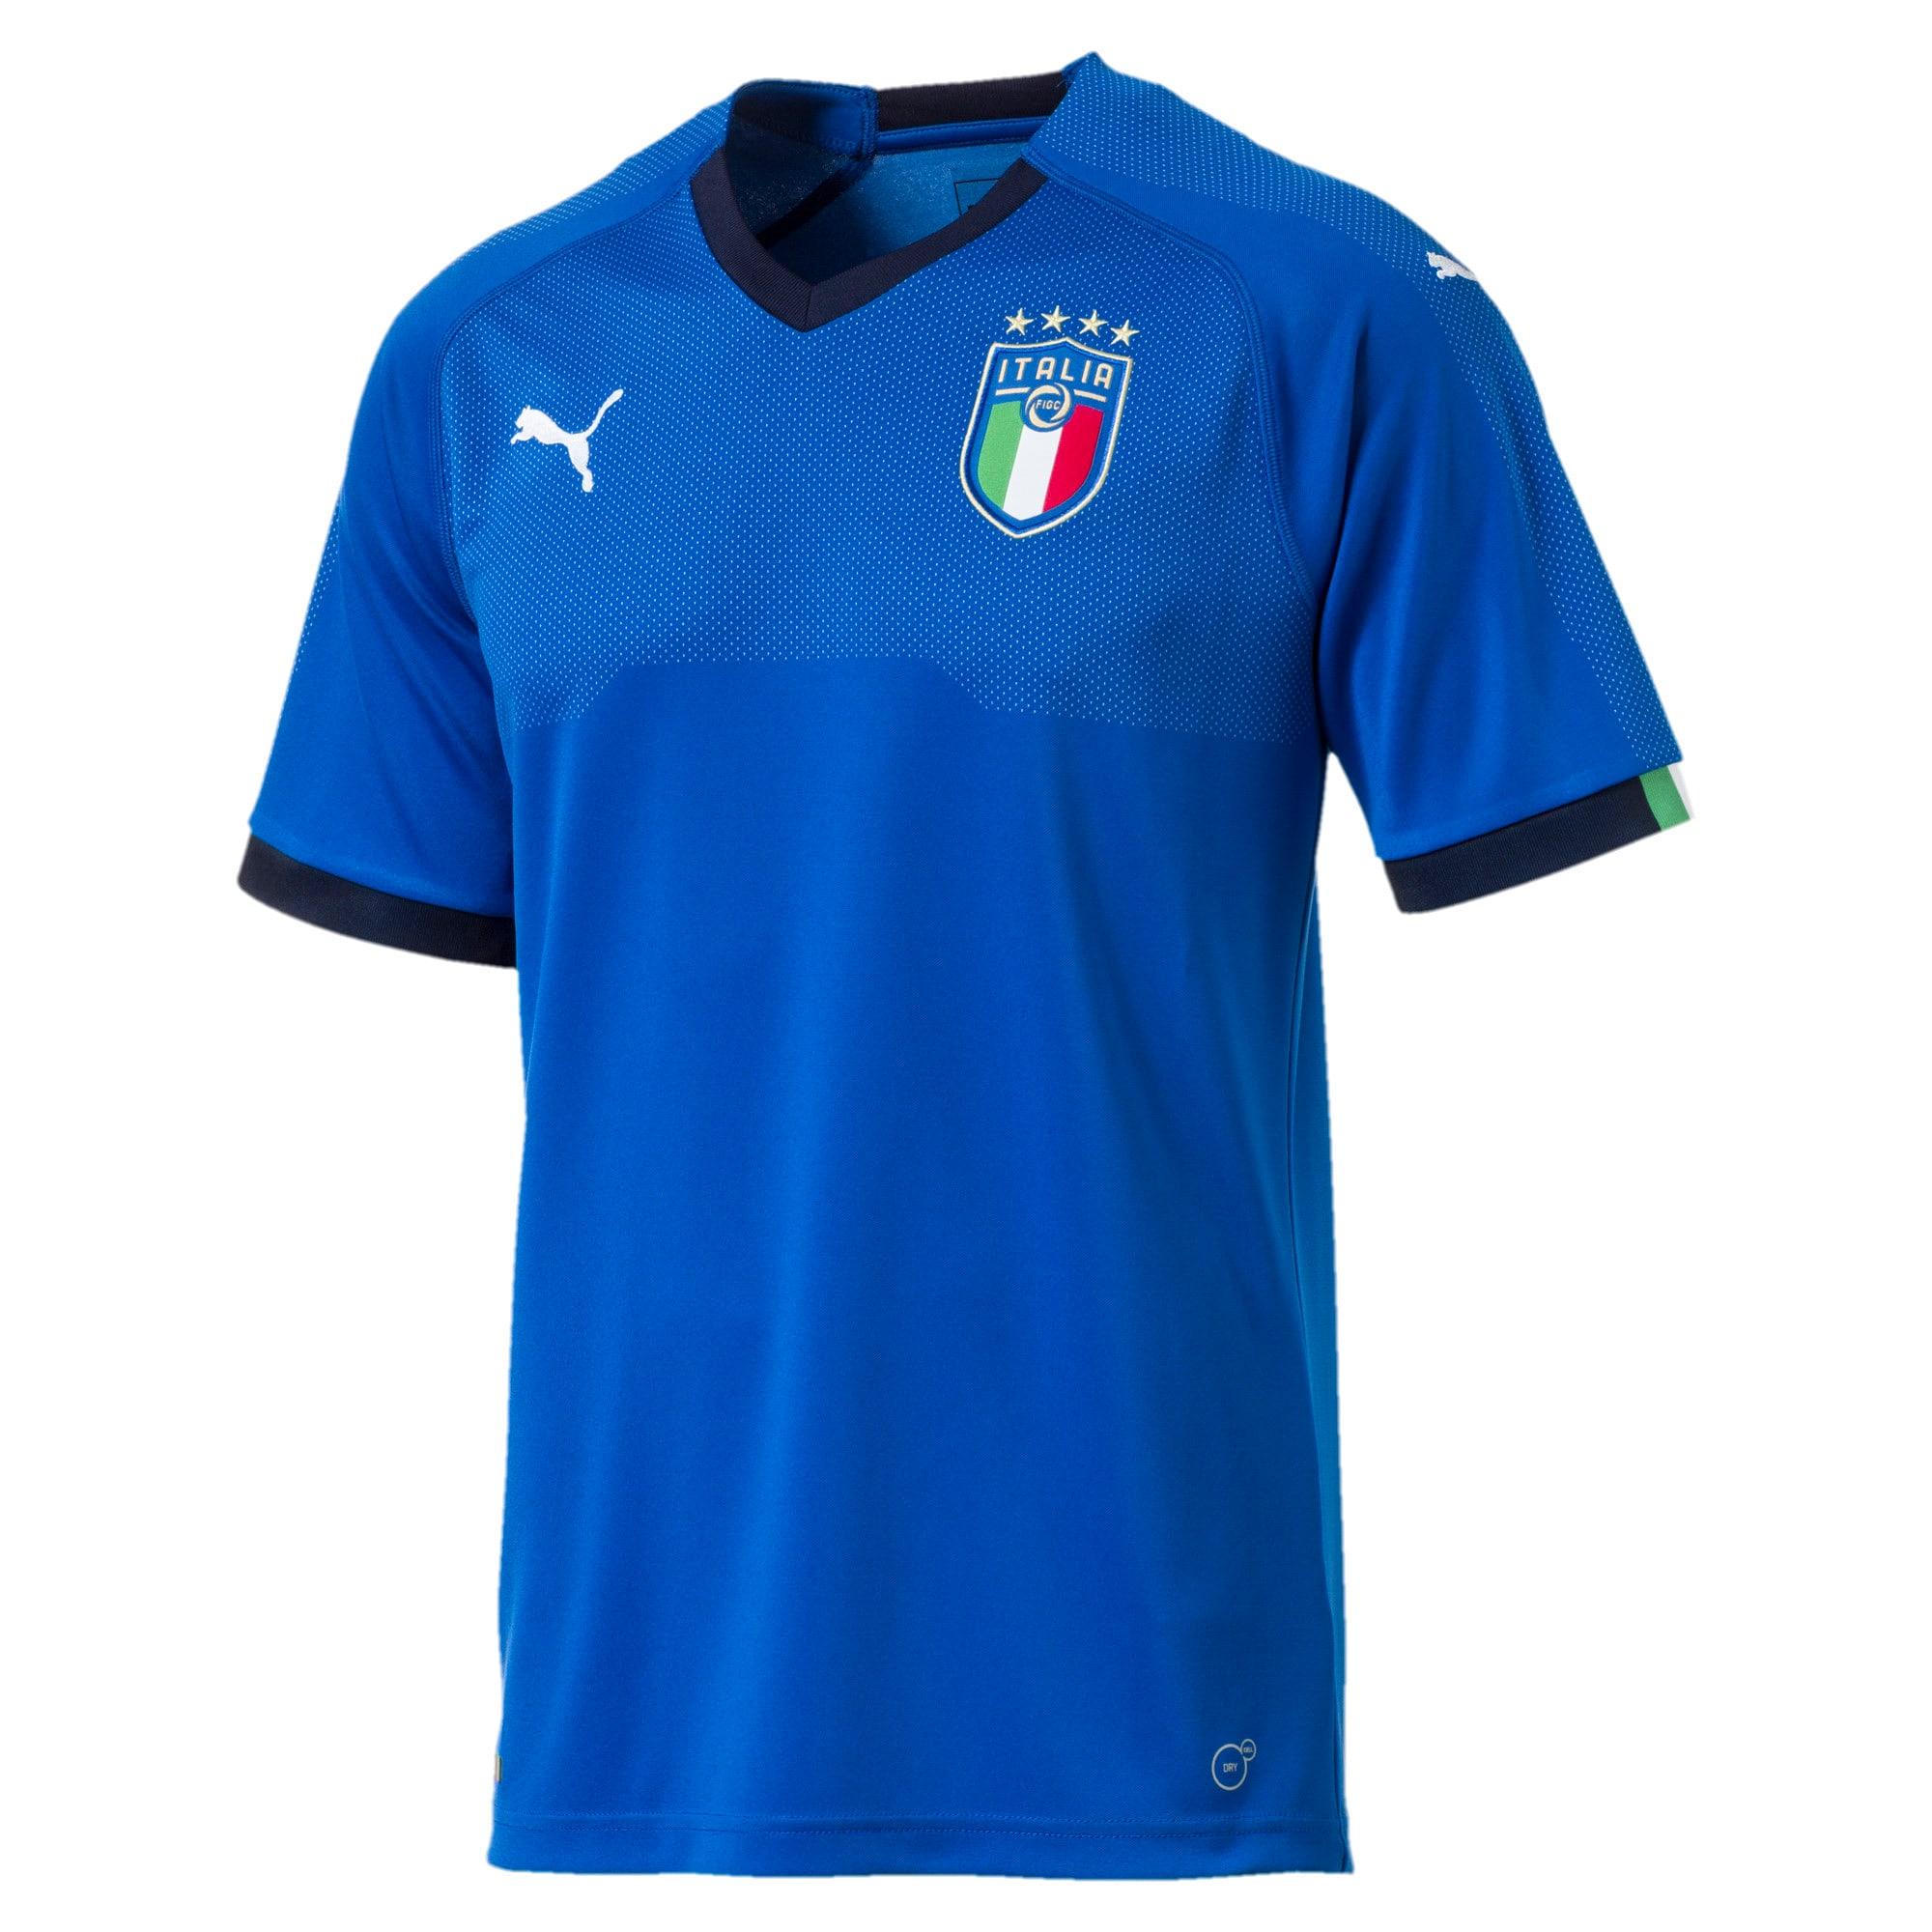 Thumbnail 4 of FIGC ITALIA HOME SHIRT REPLICA, Team Power Blue-Peacoat, medium-JPN